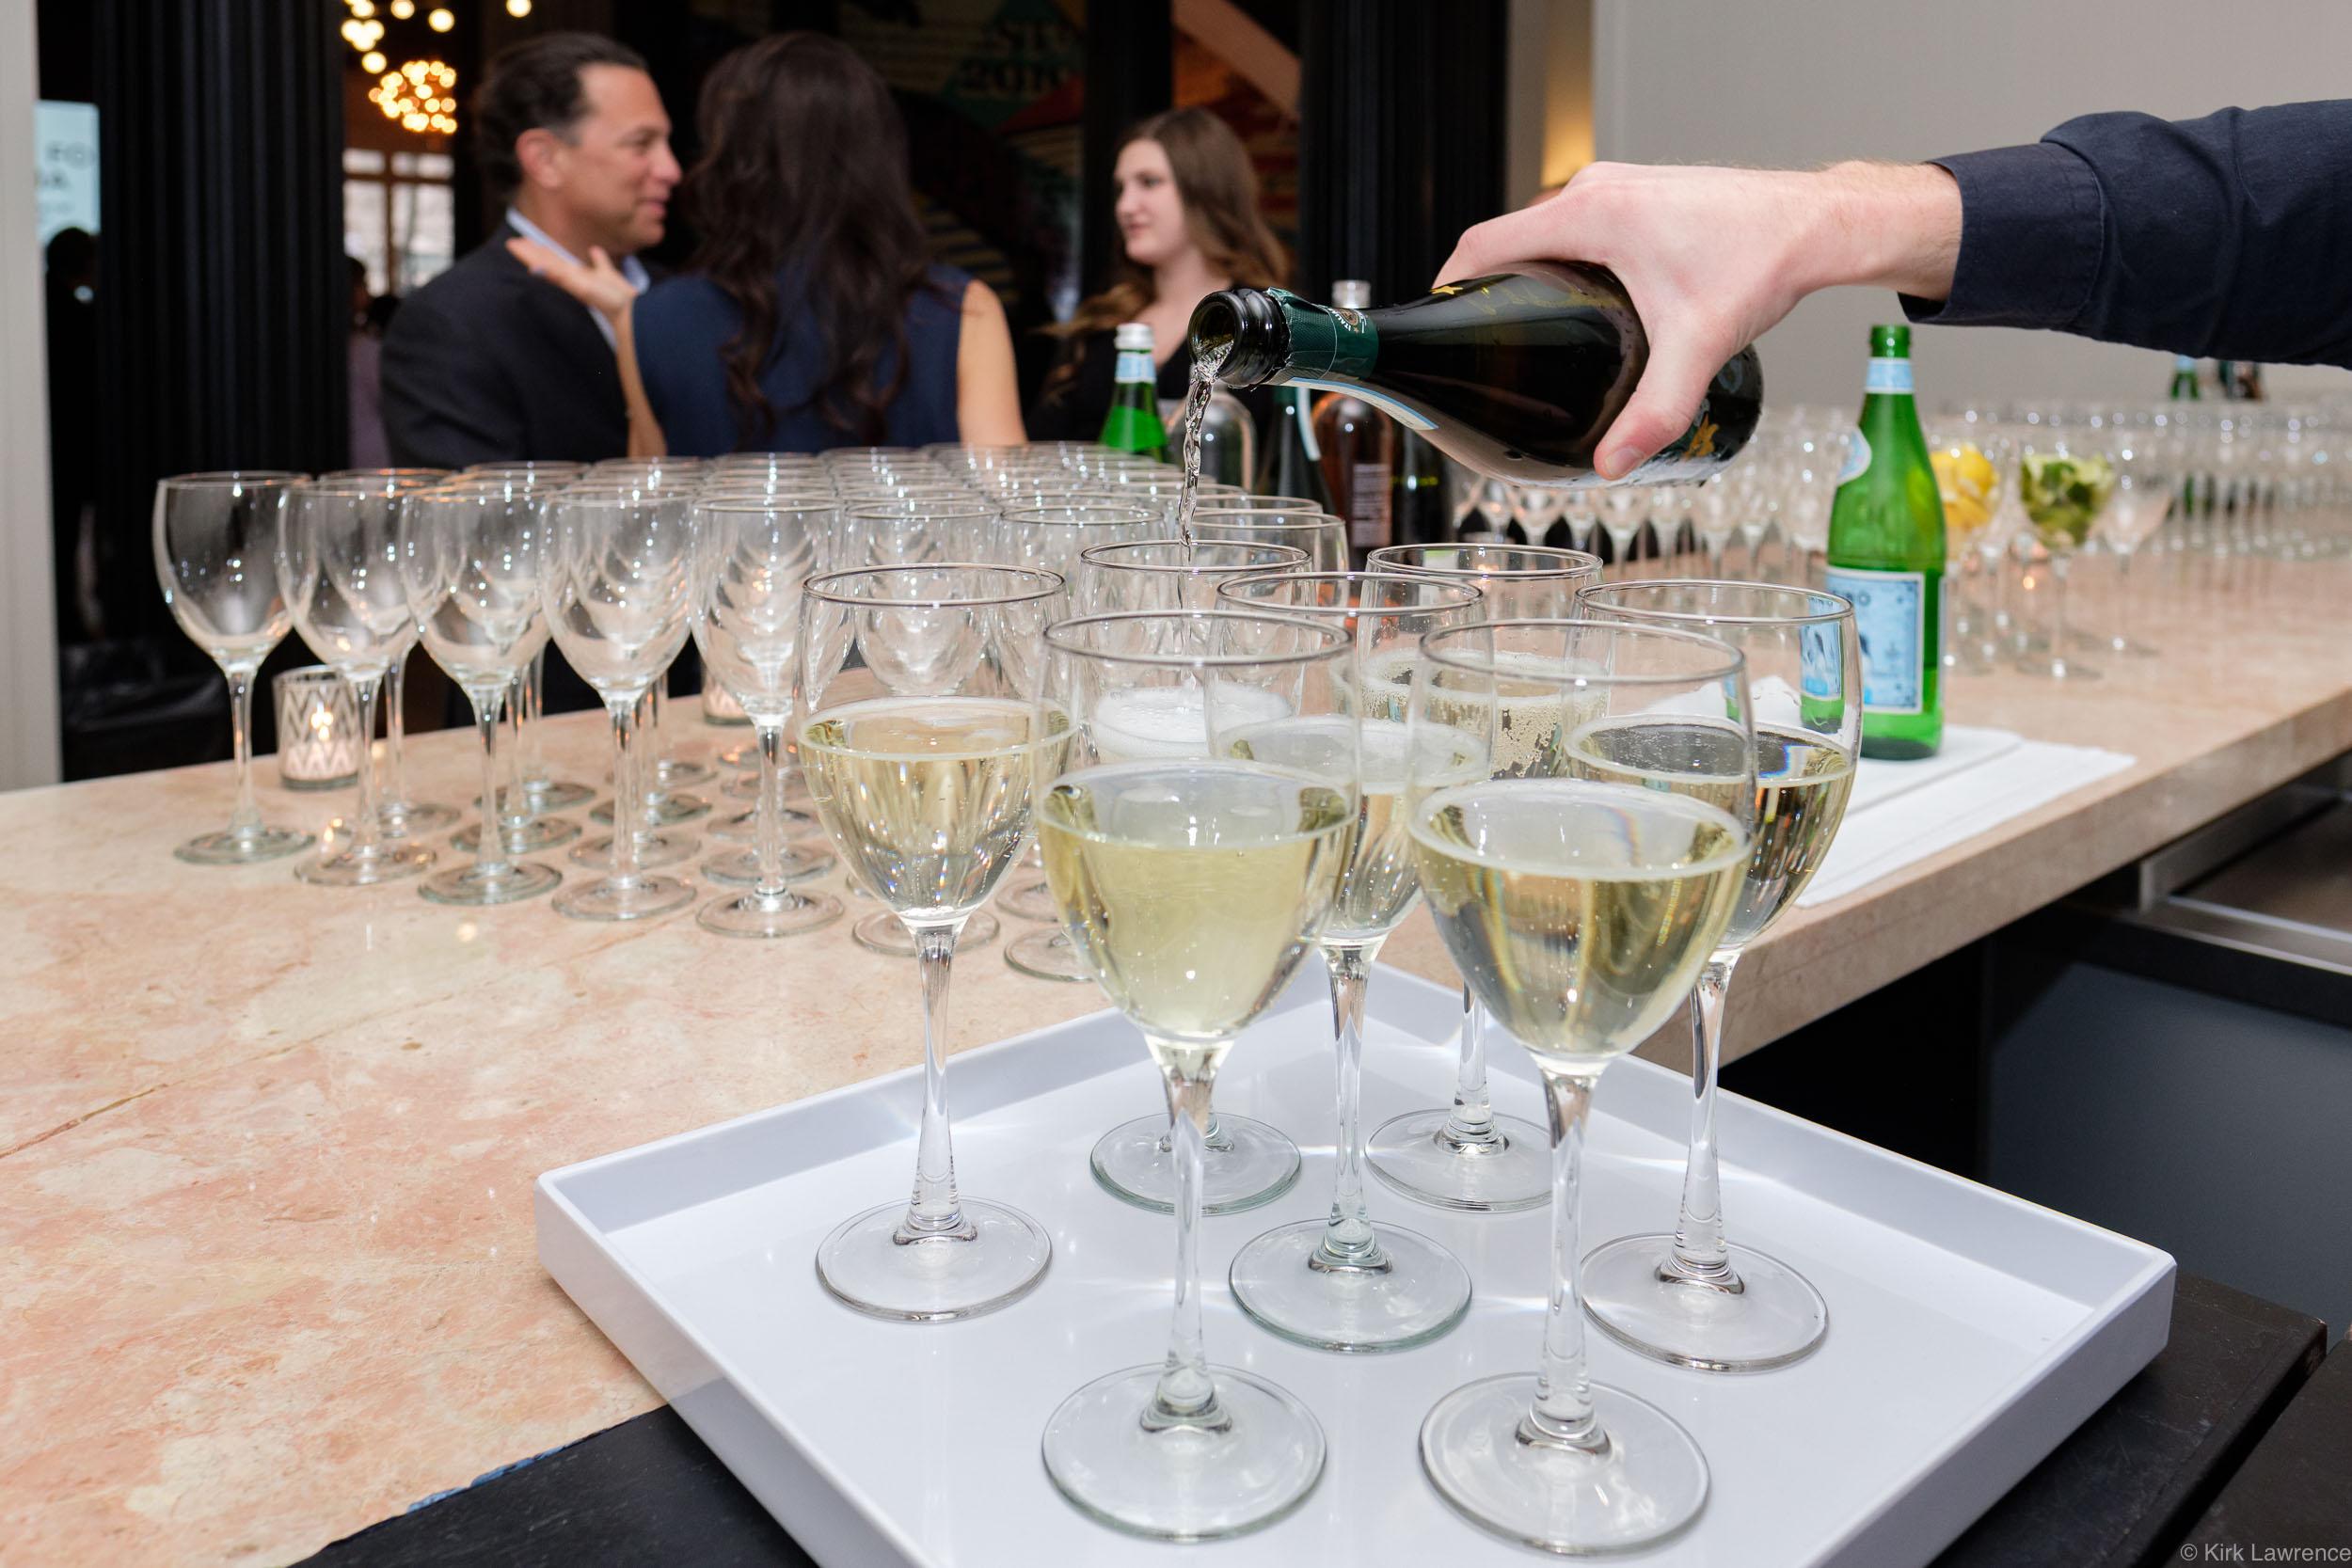 white_wine_glasses_pour_Kula_For_Karma_event.jpg